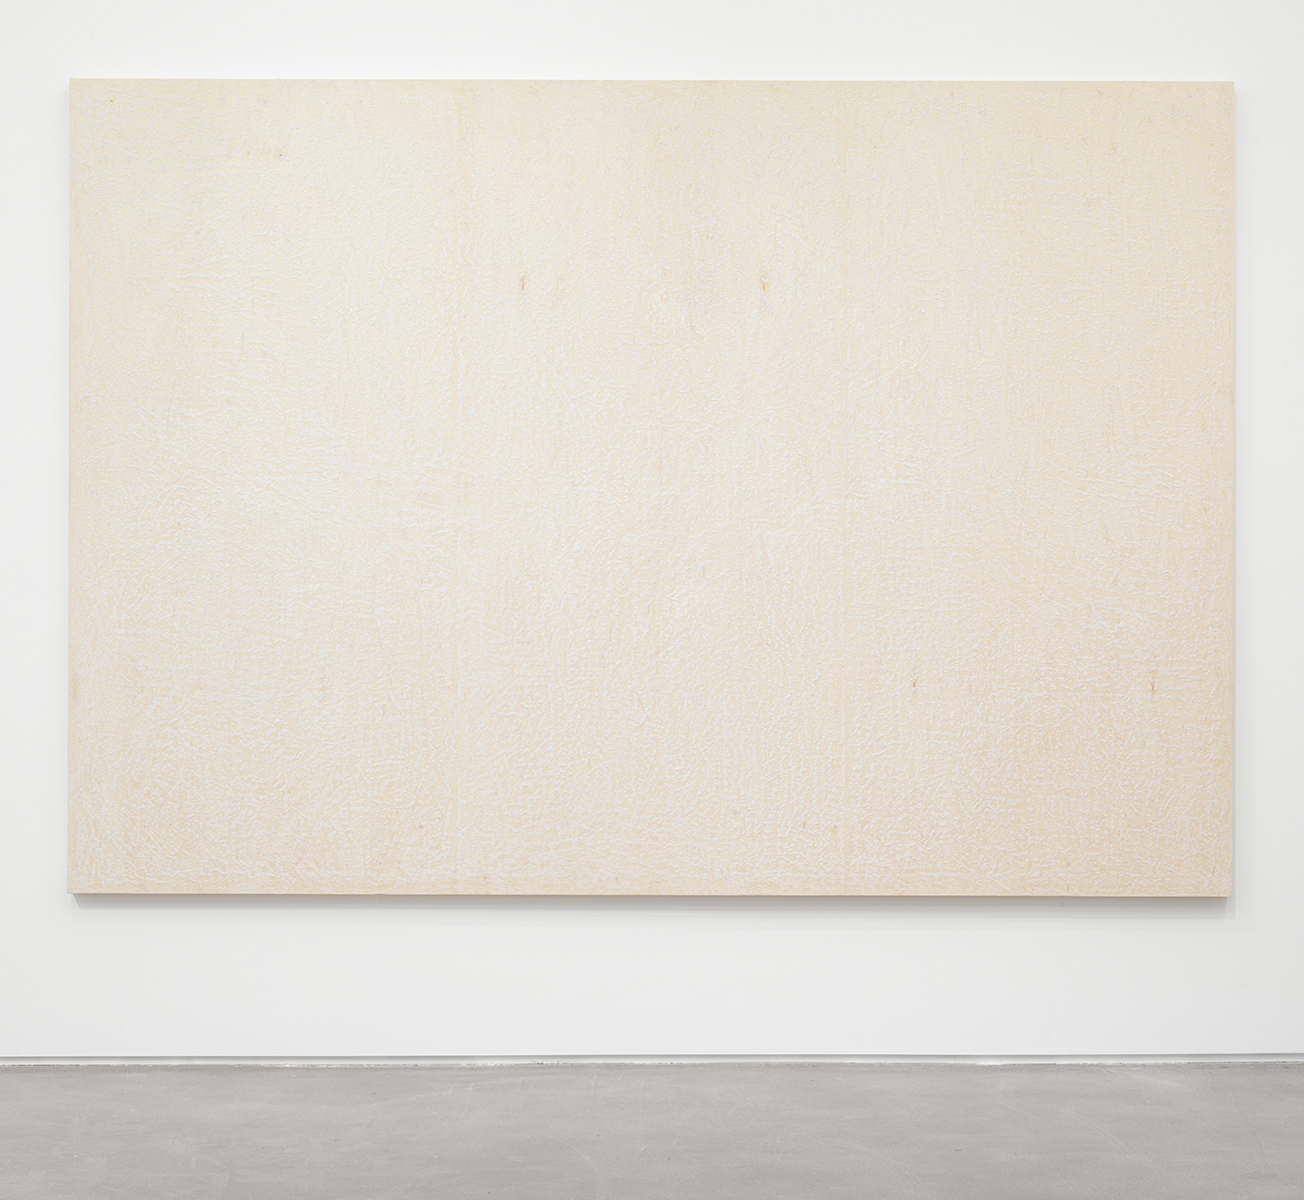 Da Bull ,2013 Surf wax on wood panel 120 x 84 inches